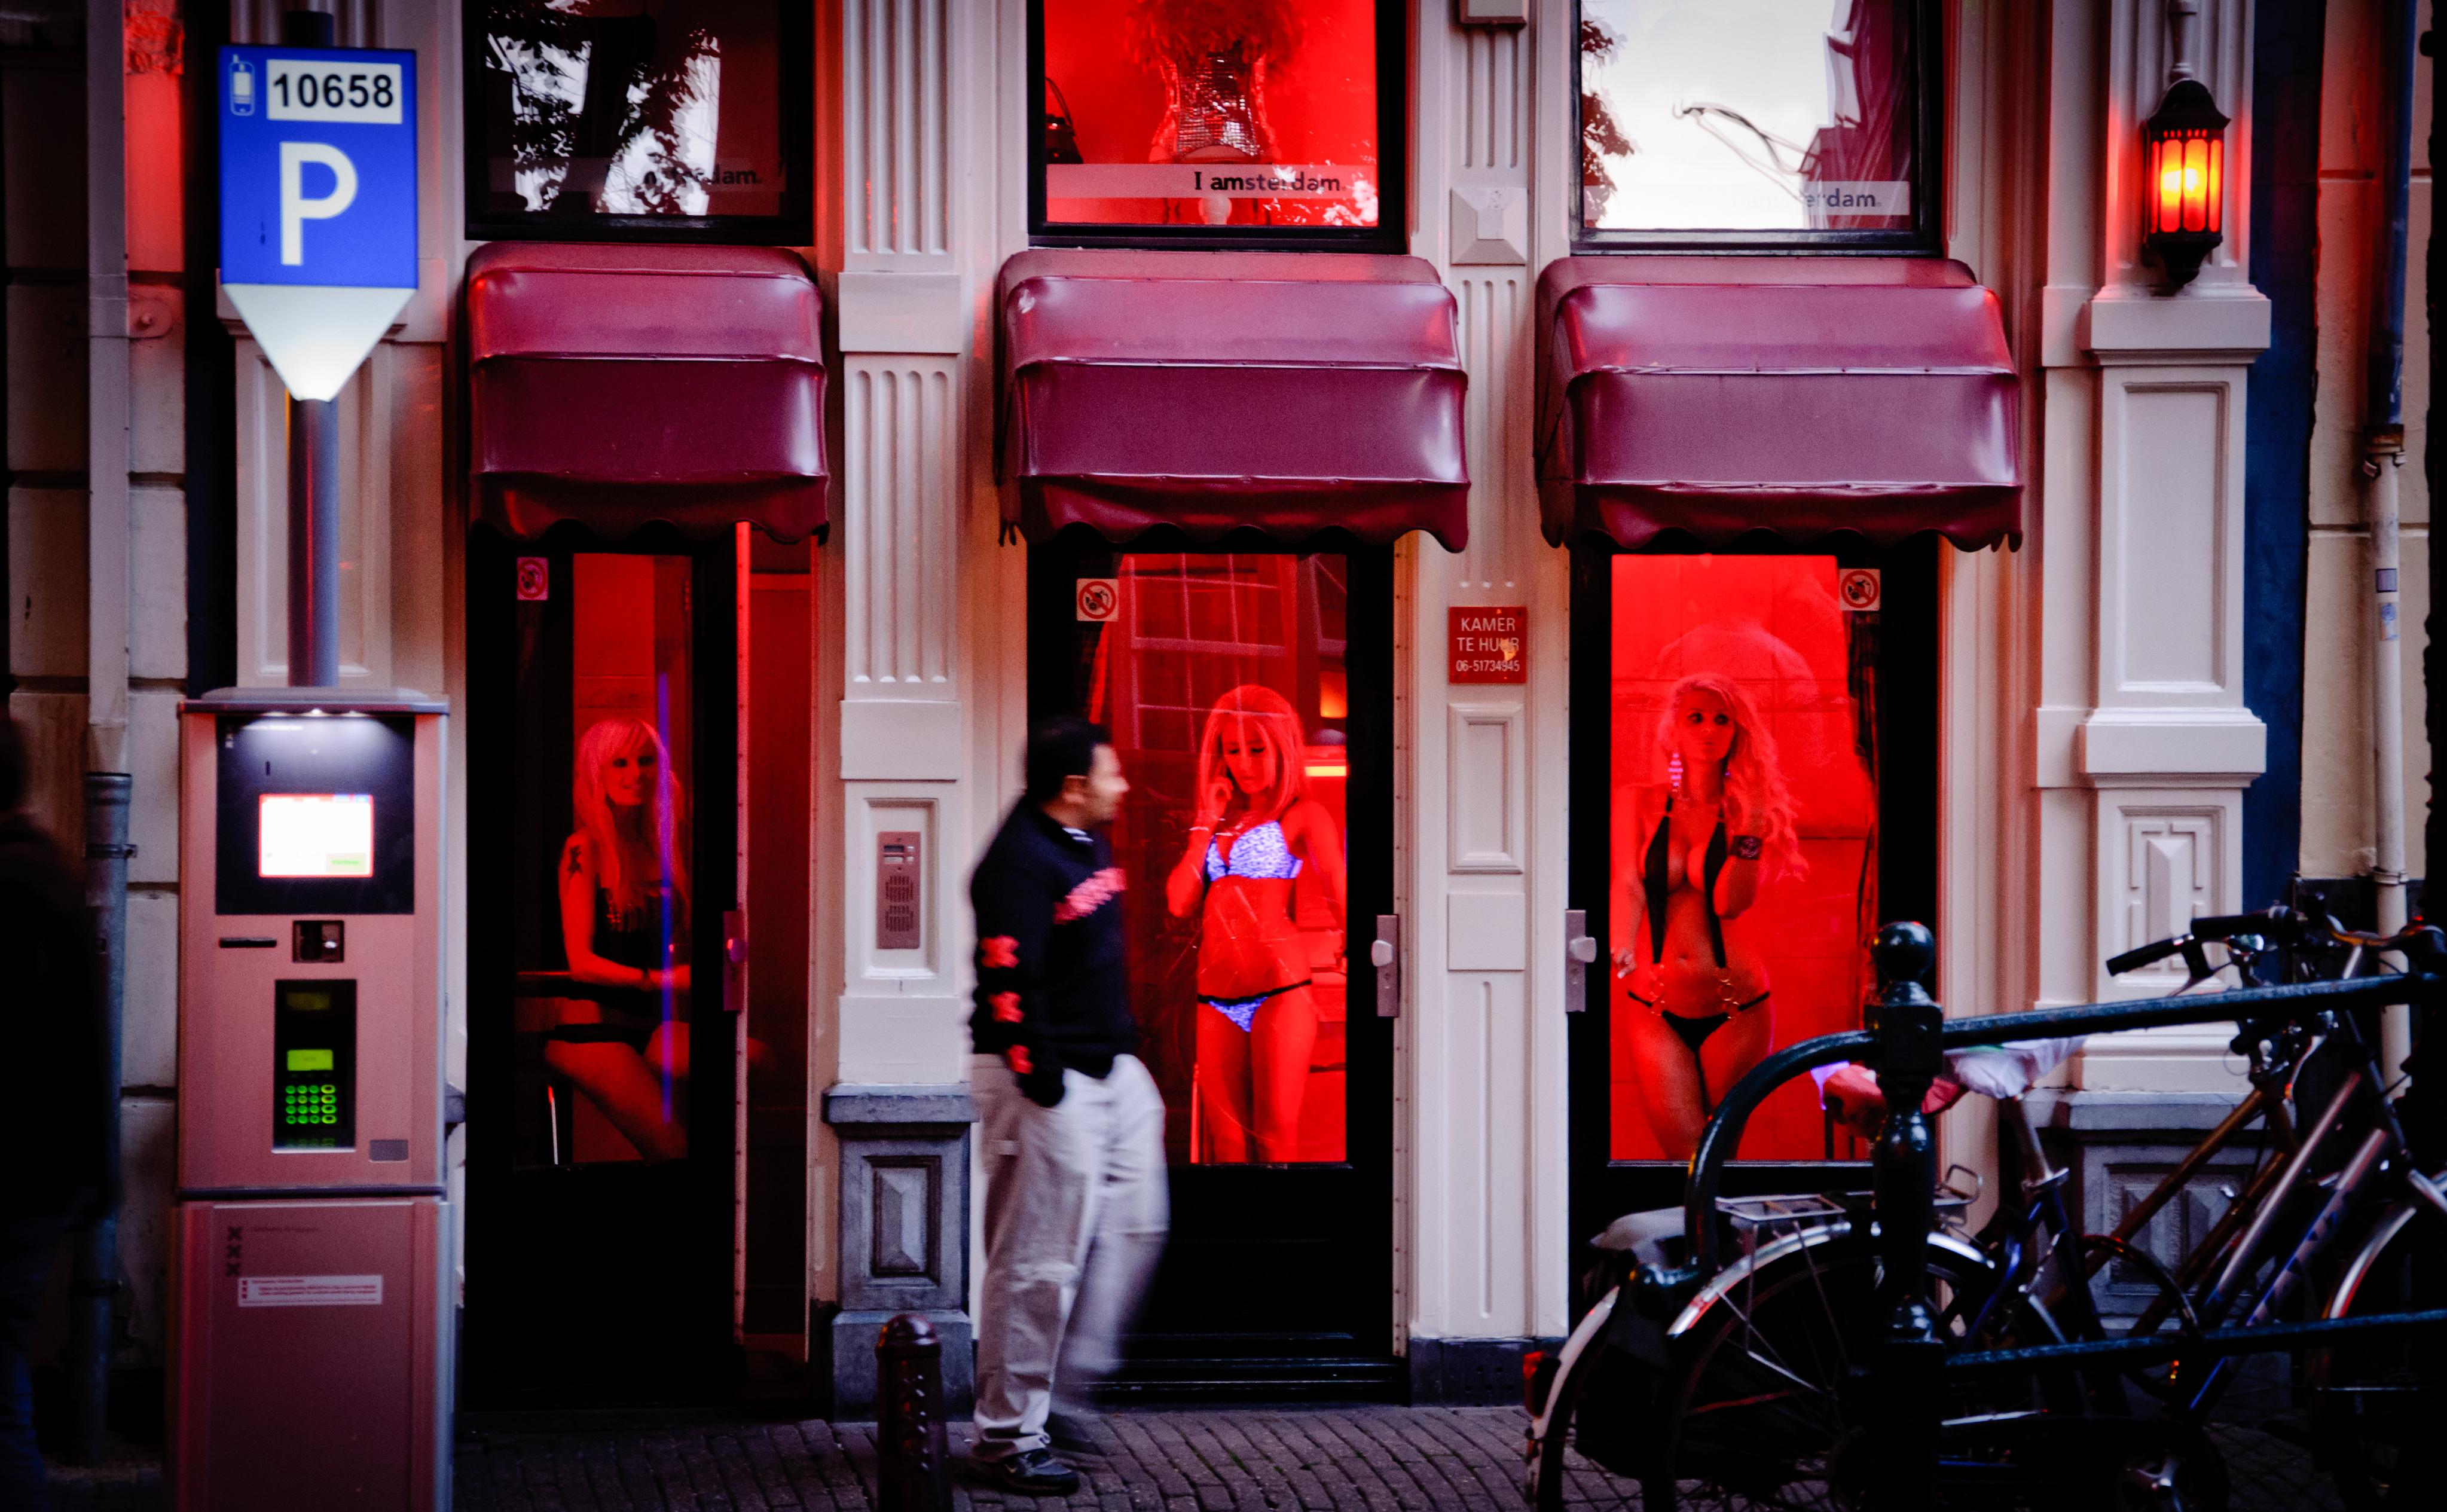 Amsterdam Red Light District - Ladies | Flickr - Photo